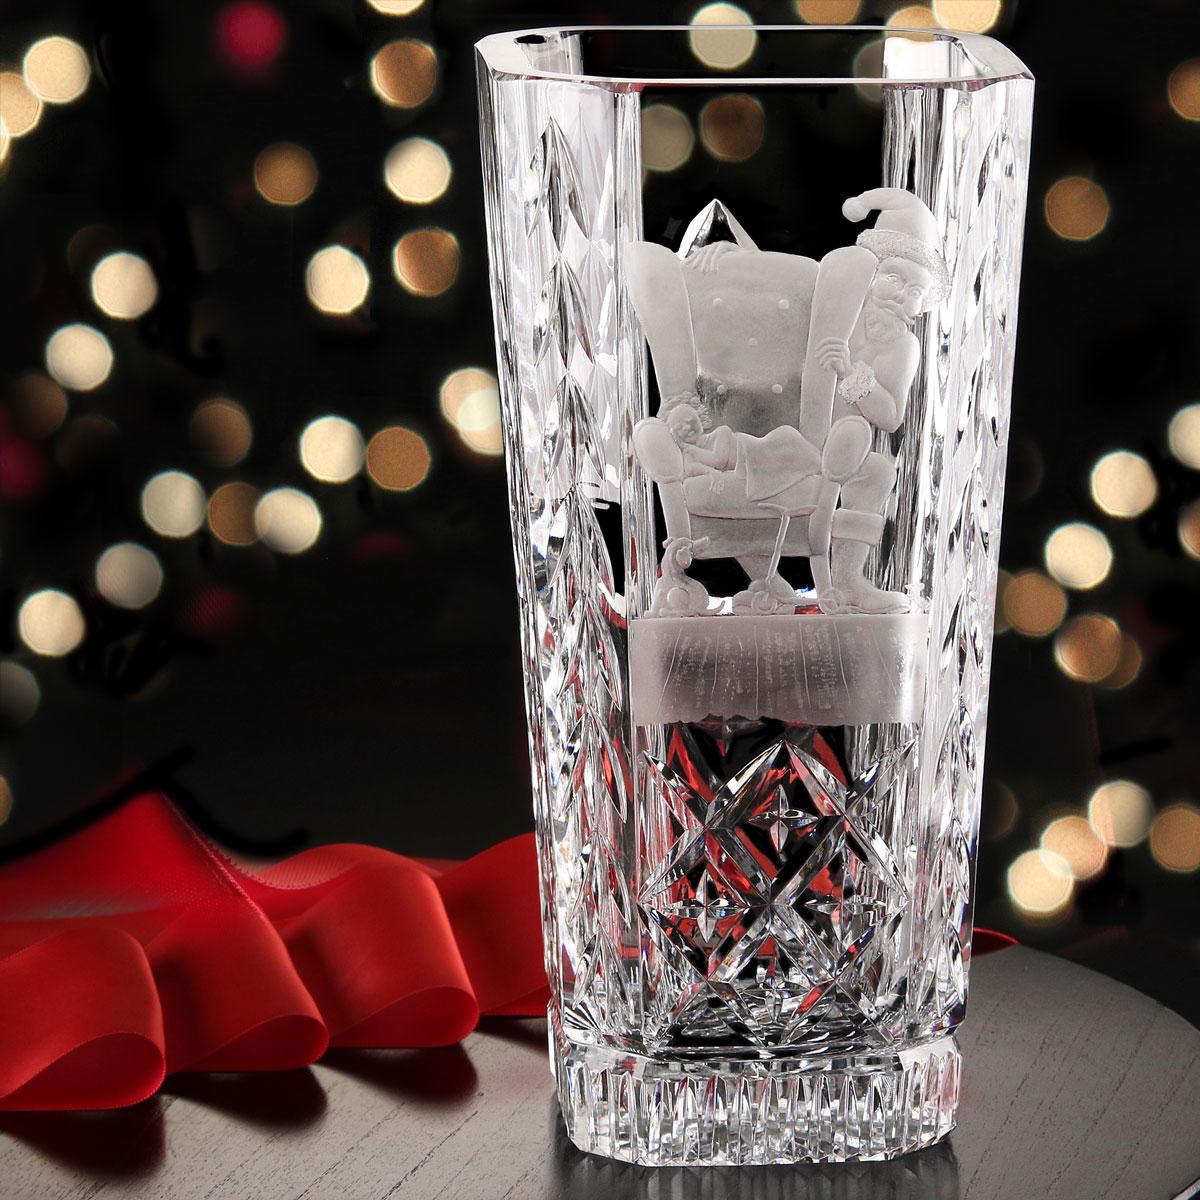 Cashs Ireland, Santa Shhh! Vase, Limited Edition